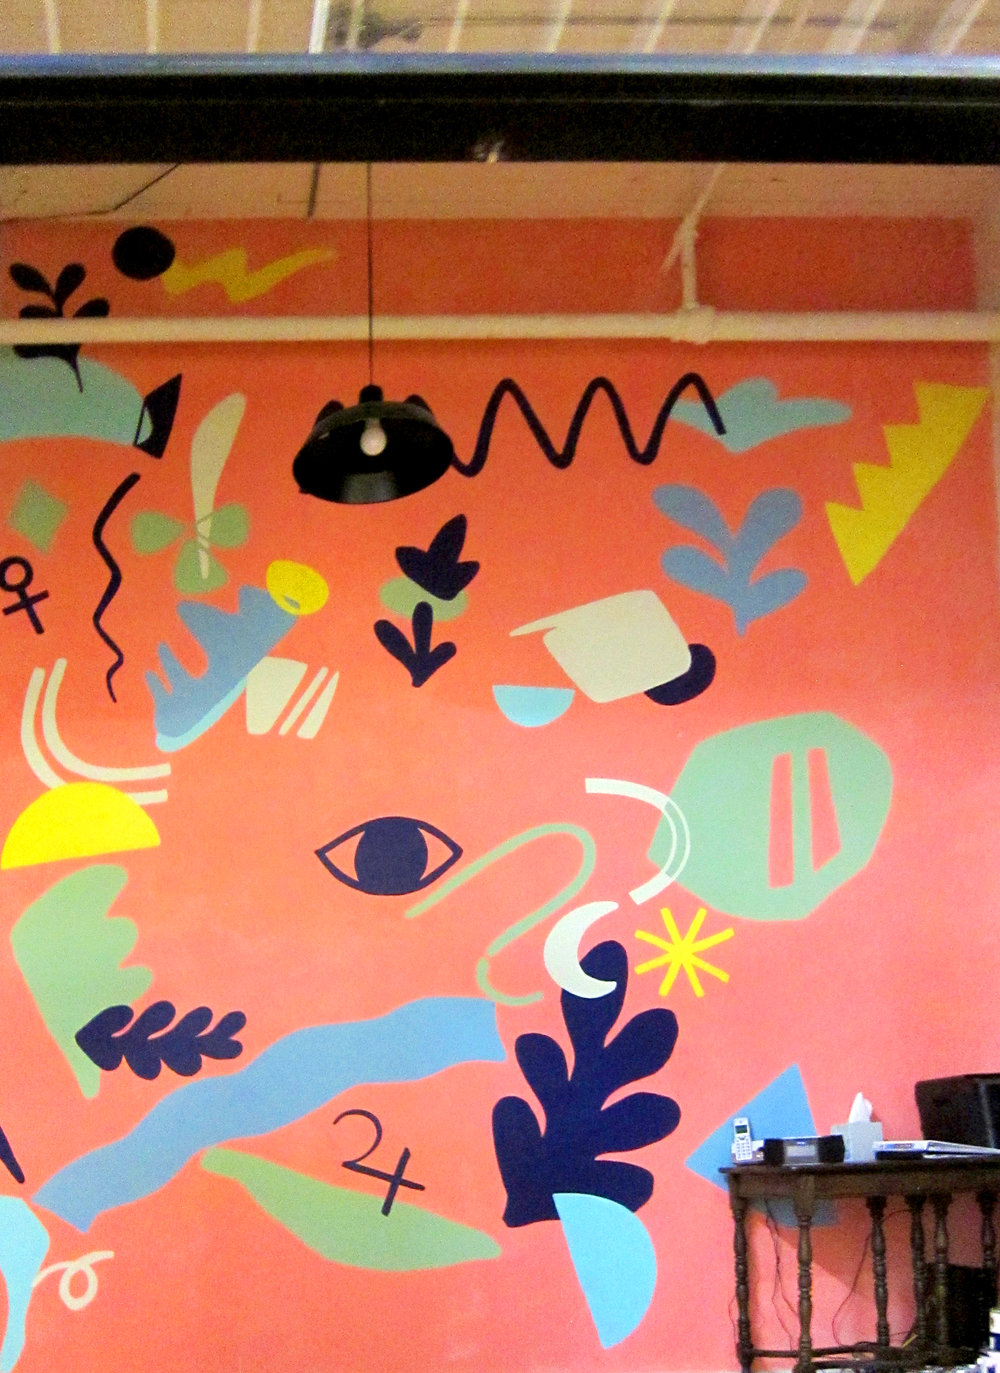 Open Hand Mural. 14' x 16'. 2018.